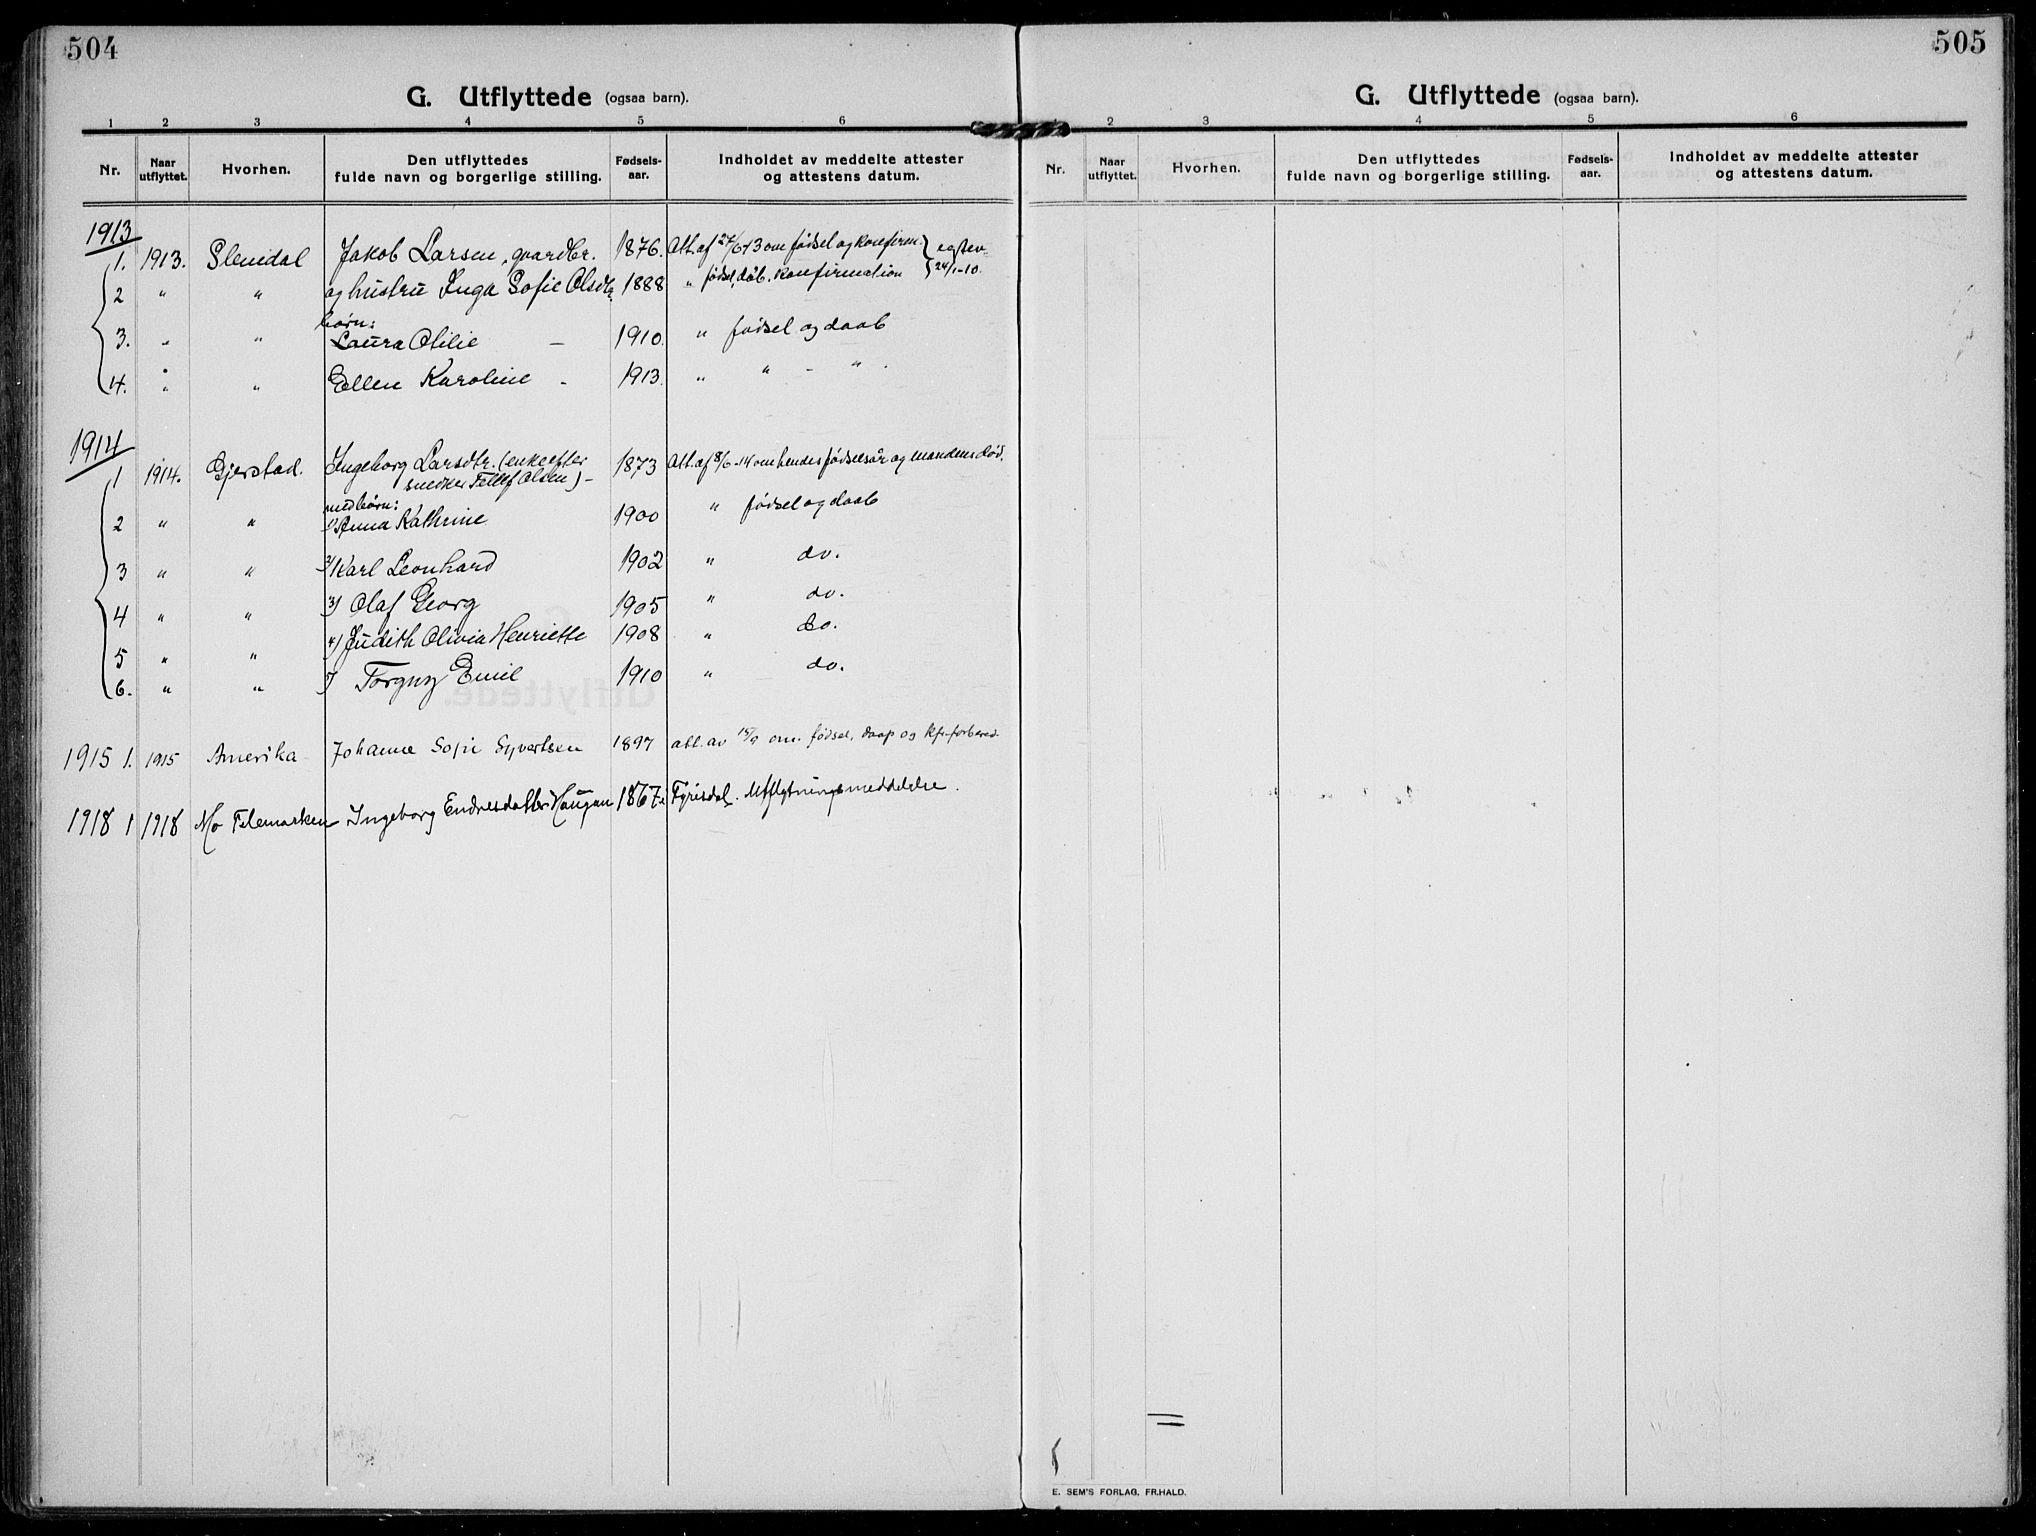 SAKO, Solum kirkebøker, F/Fb/L0004: Ministerialbok nr. II 4, 1913-1924, s. 504-505